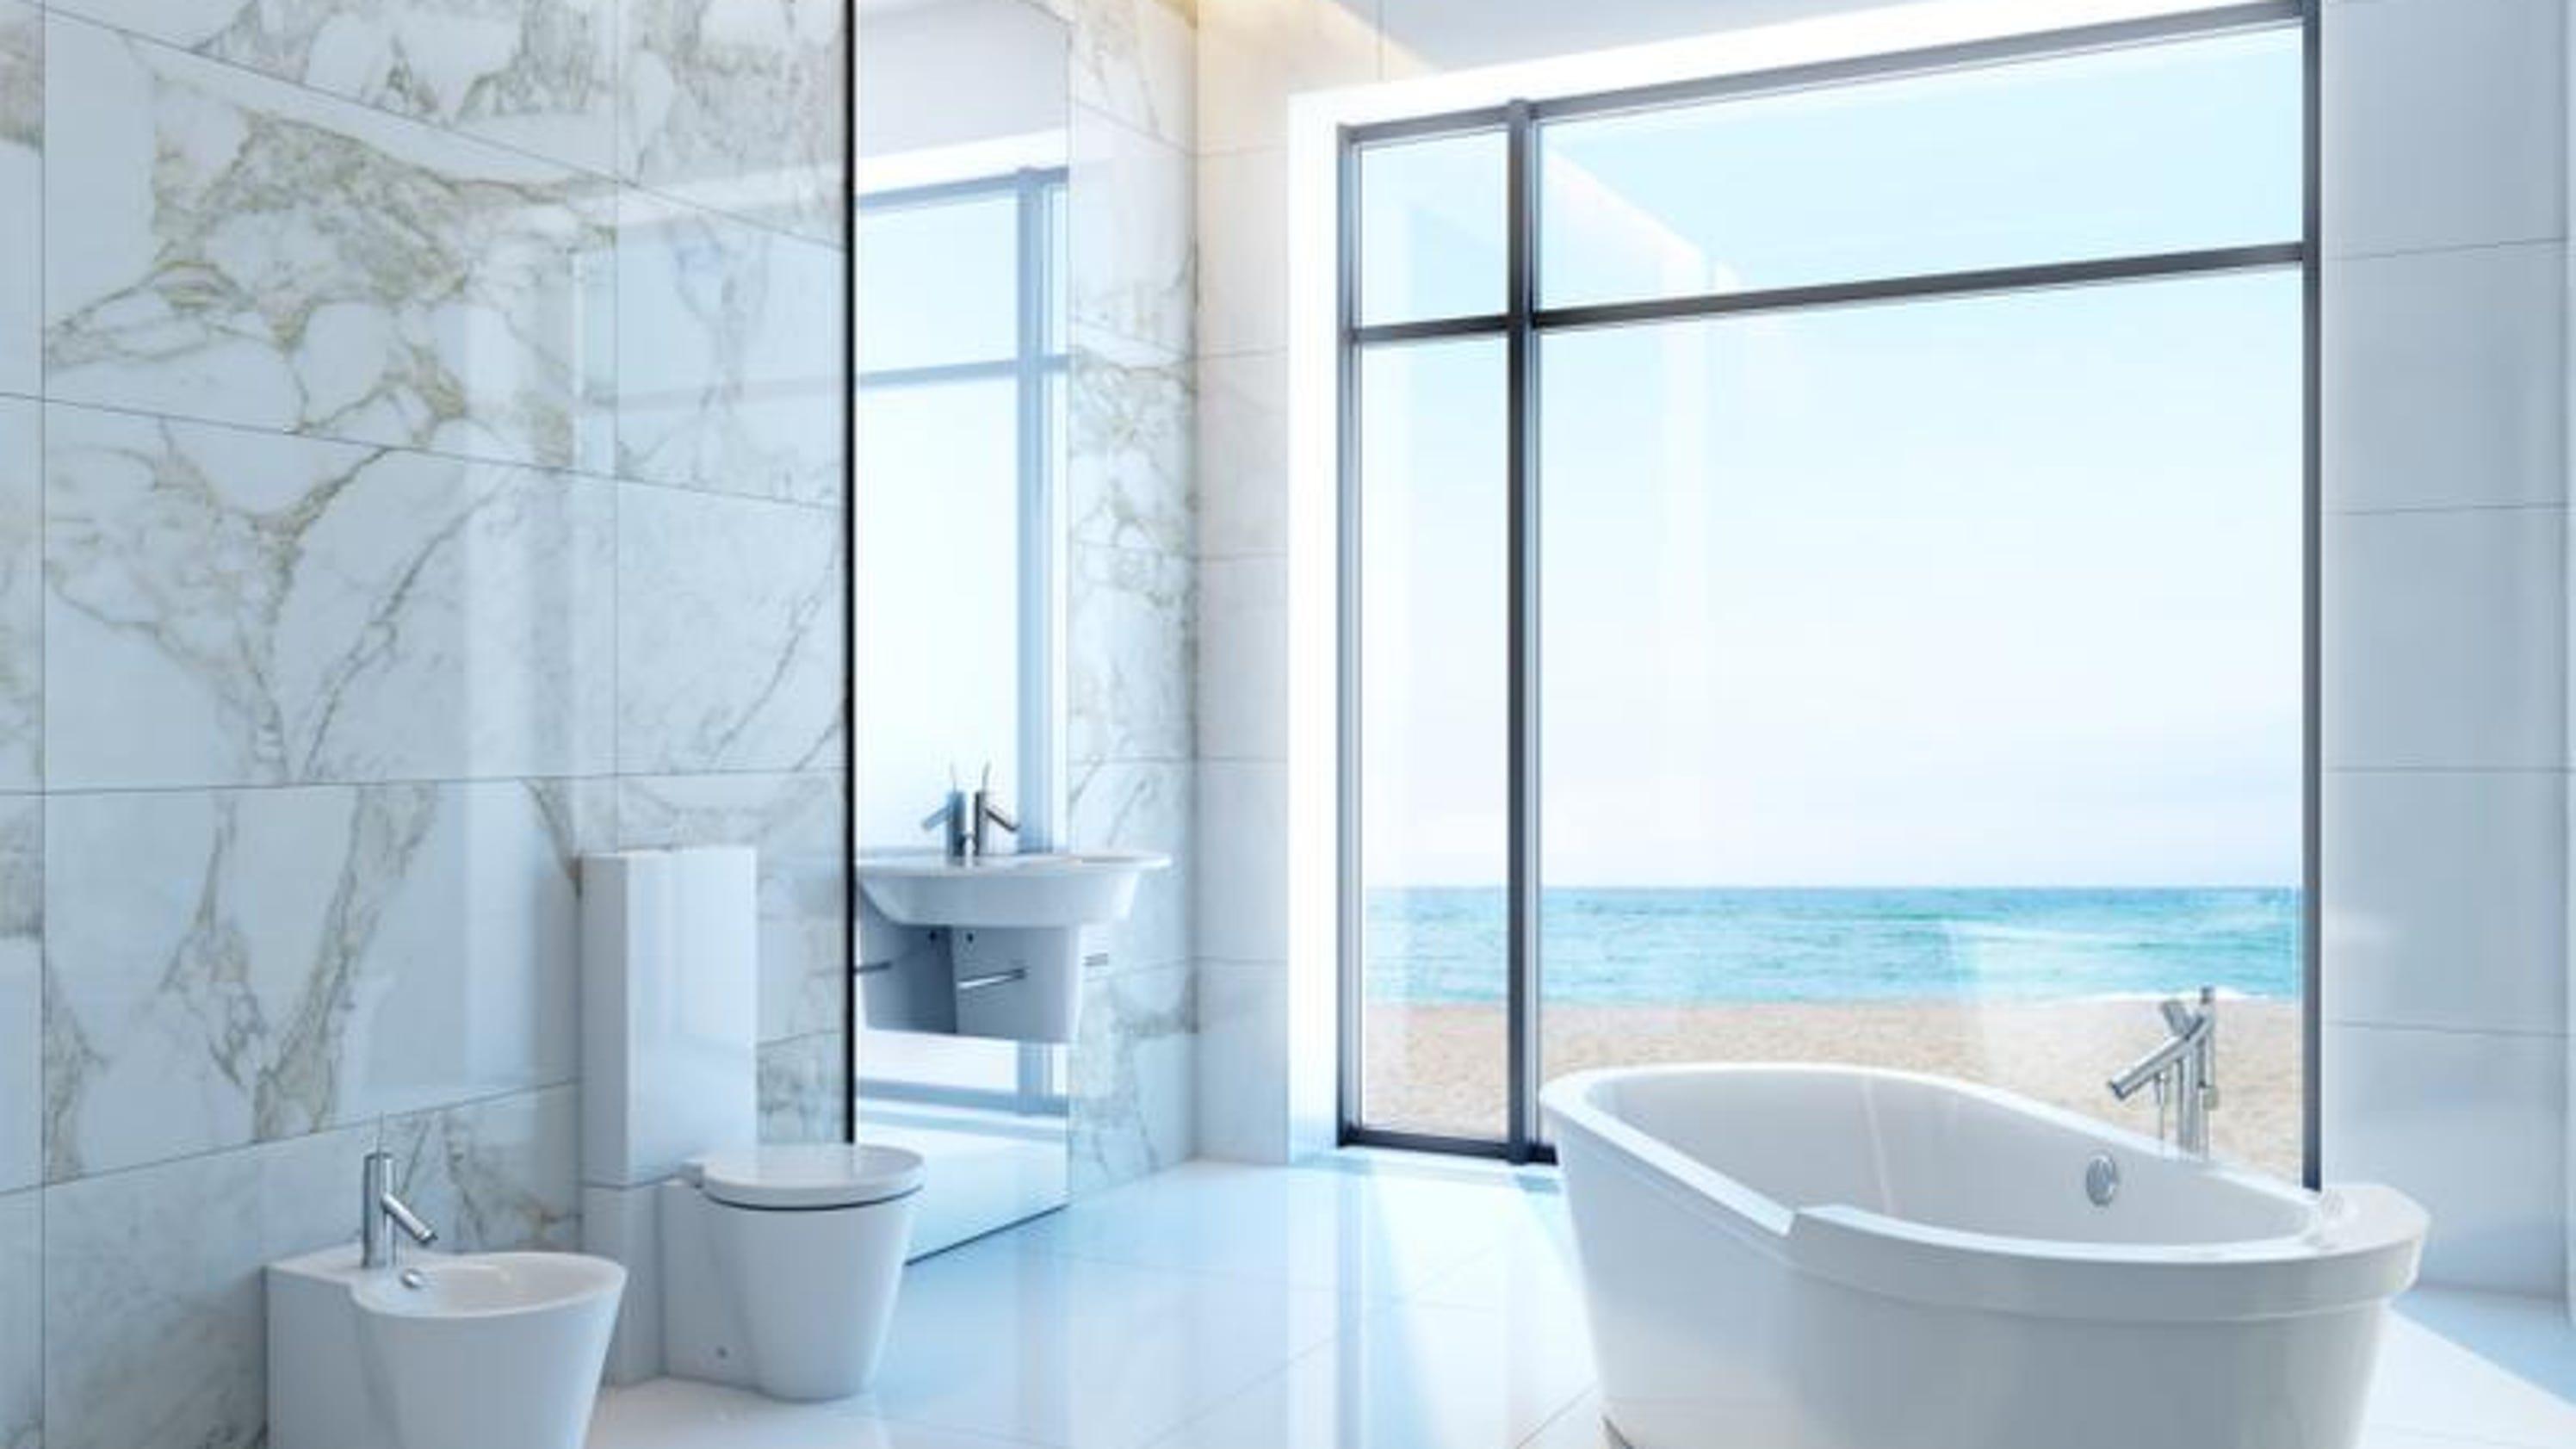 Amazing 72 Soaking Tub Motif - Bathtub Ideas - dilata.info